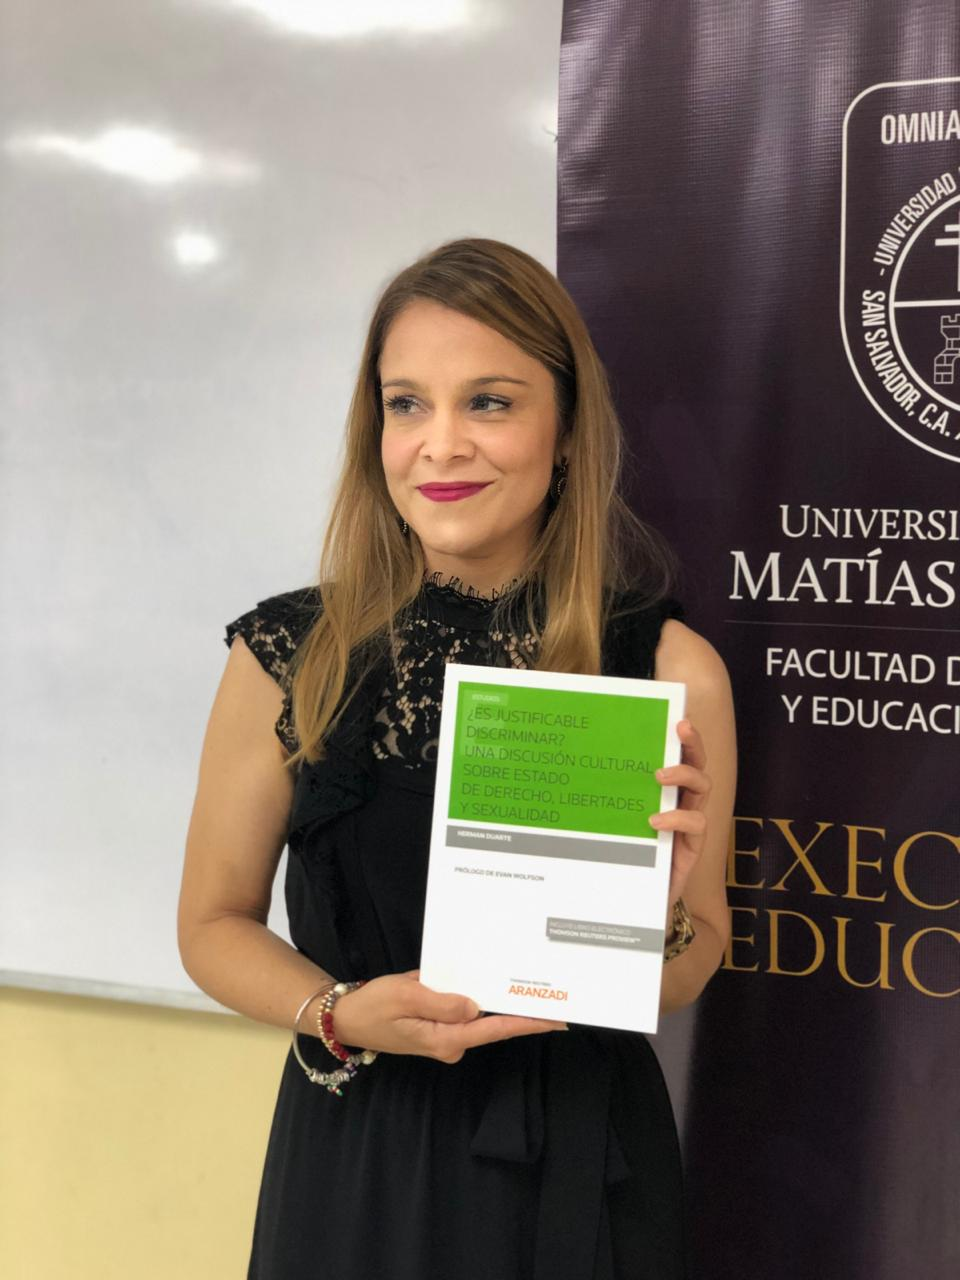 Dra. Lidia Castillo estuvo a cargo del evento, recibiendo una copia del libro.